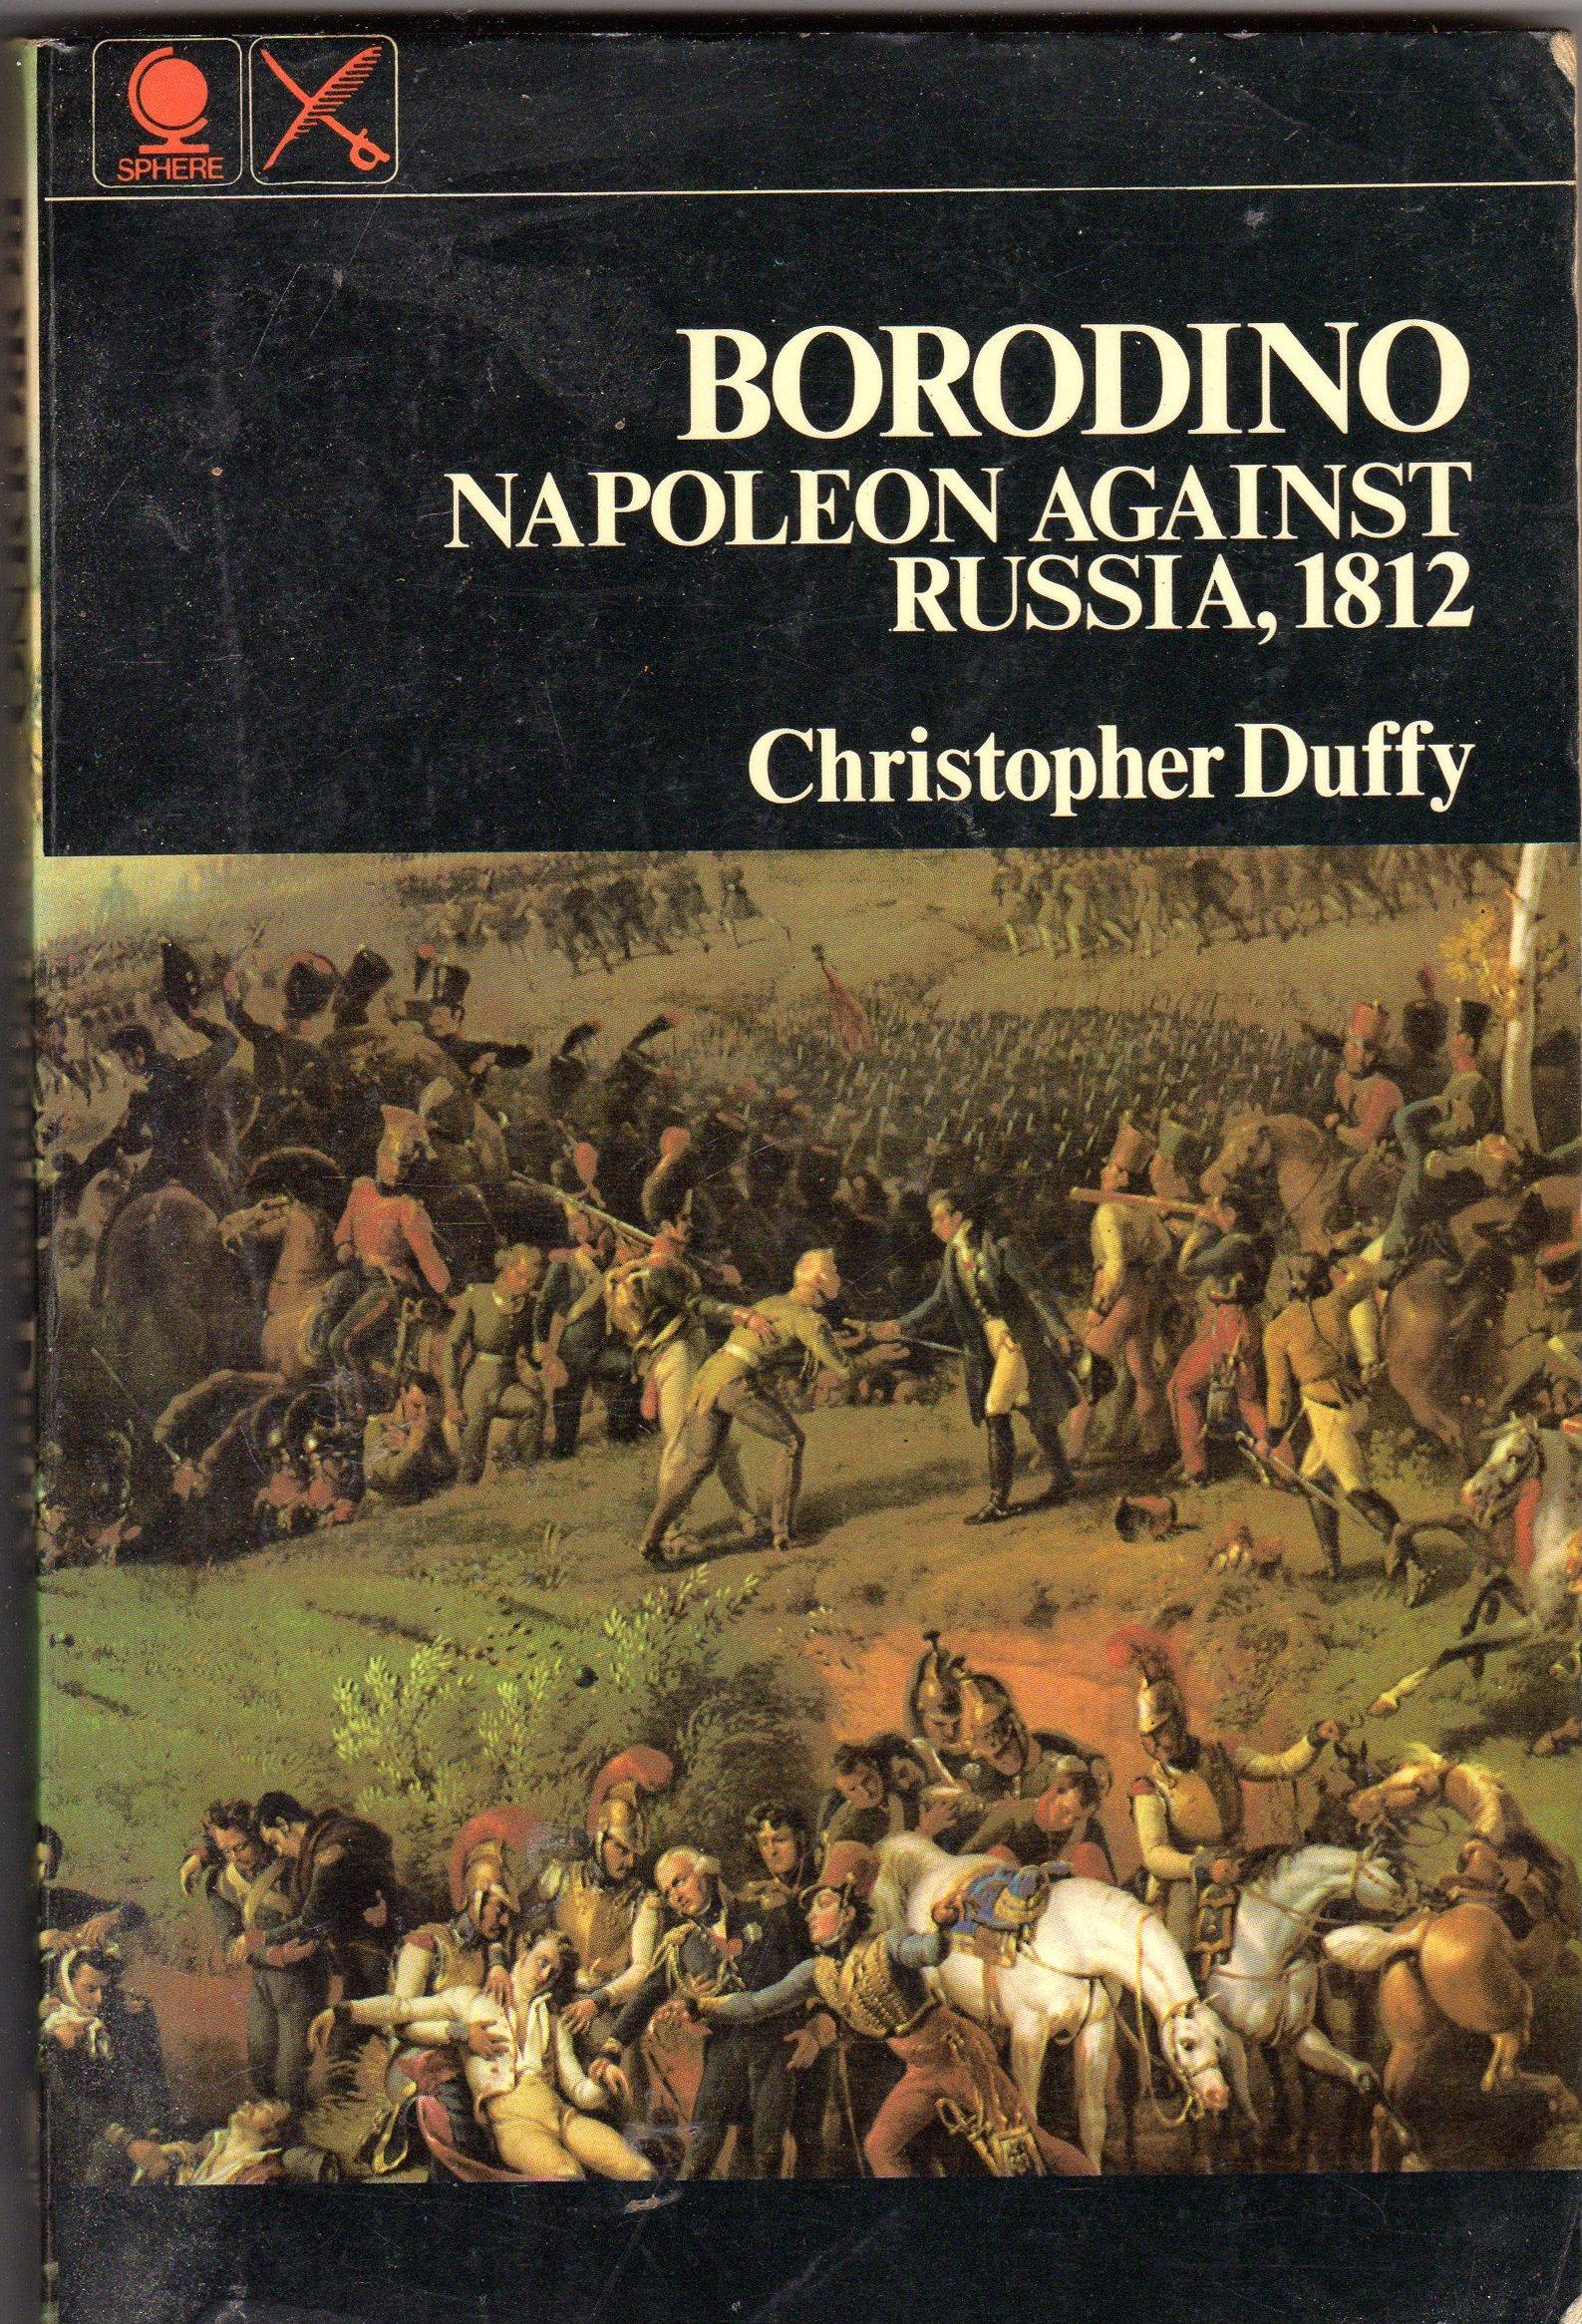 BORODINO: NAPOLEON AGAINST RUSSIA, 1812: Amazon.co.uk: Chistopher Duffy:  Books